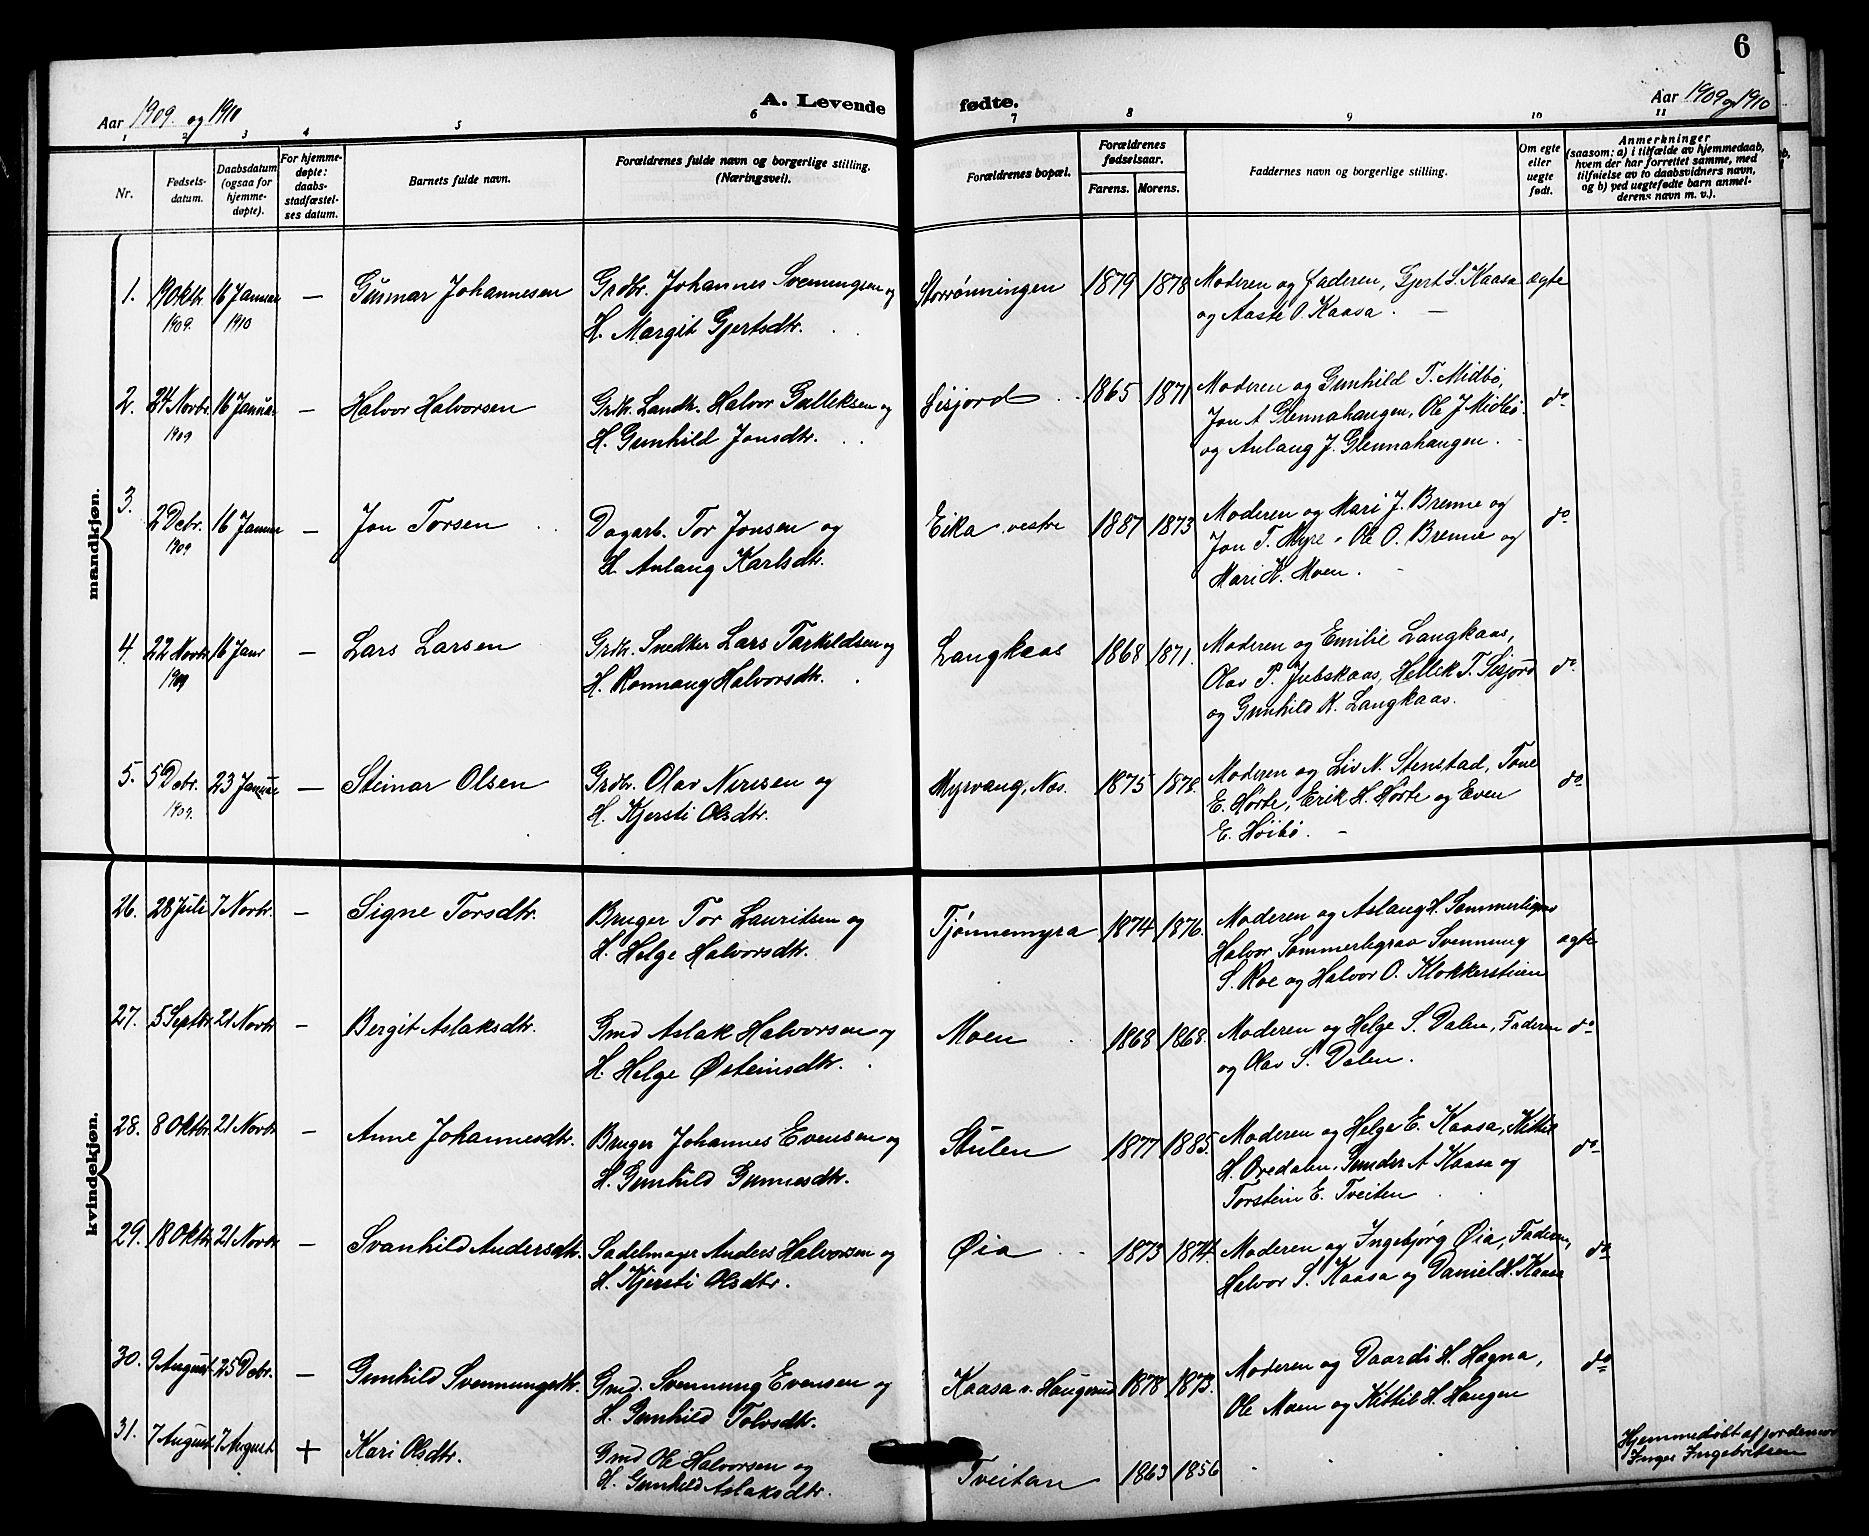 SAKO, Bø kirkebøker, G/Ga/L0007: Klokkerbok nr. 7, 1909-1924, s. 6